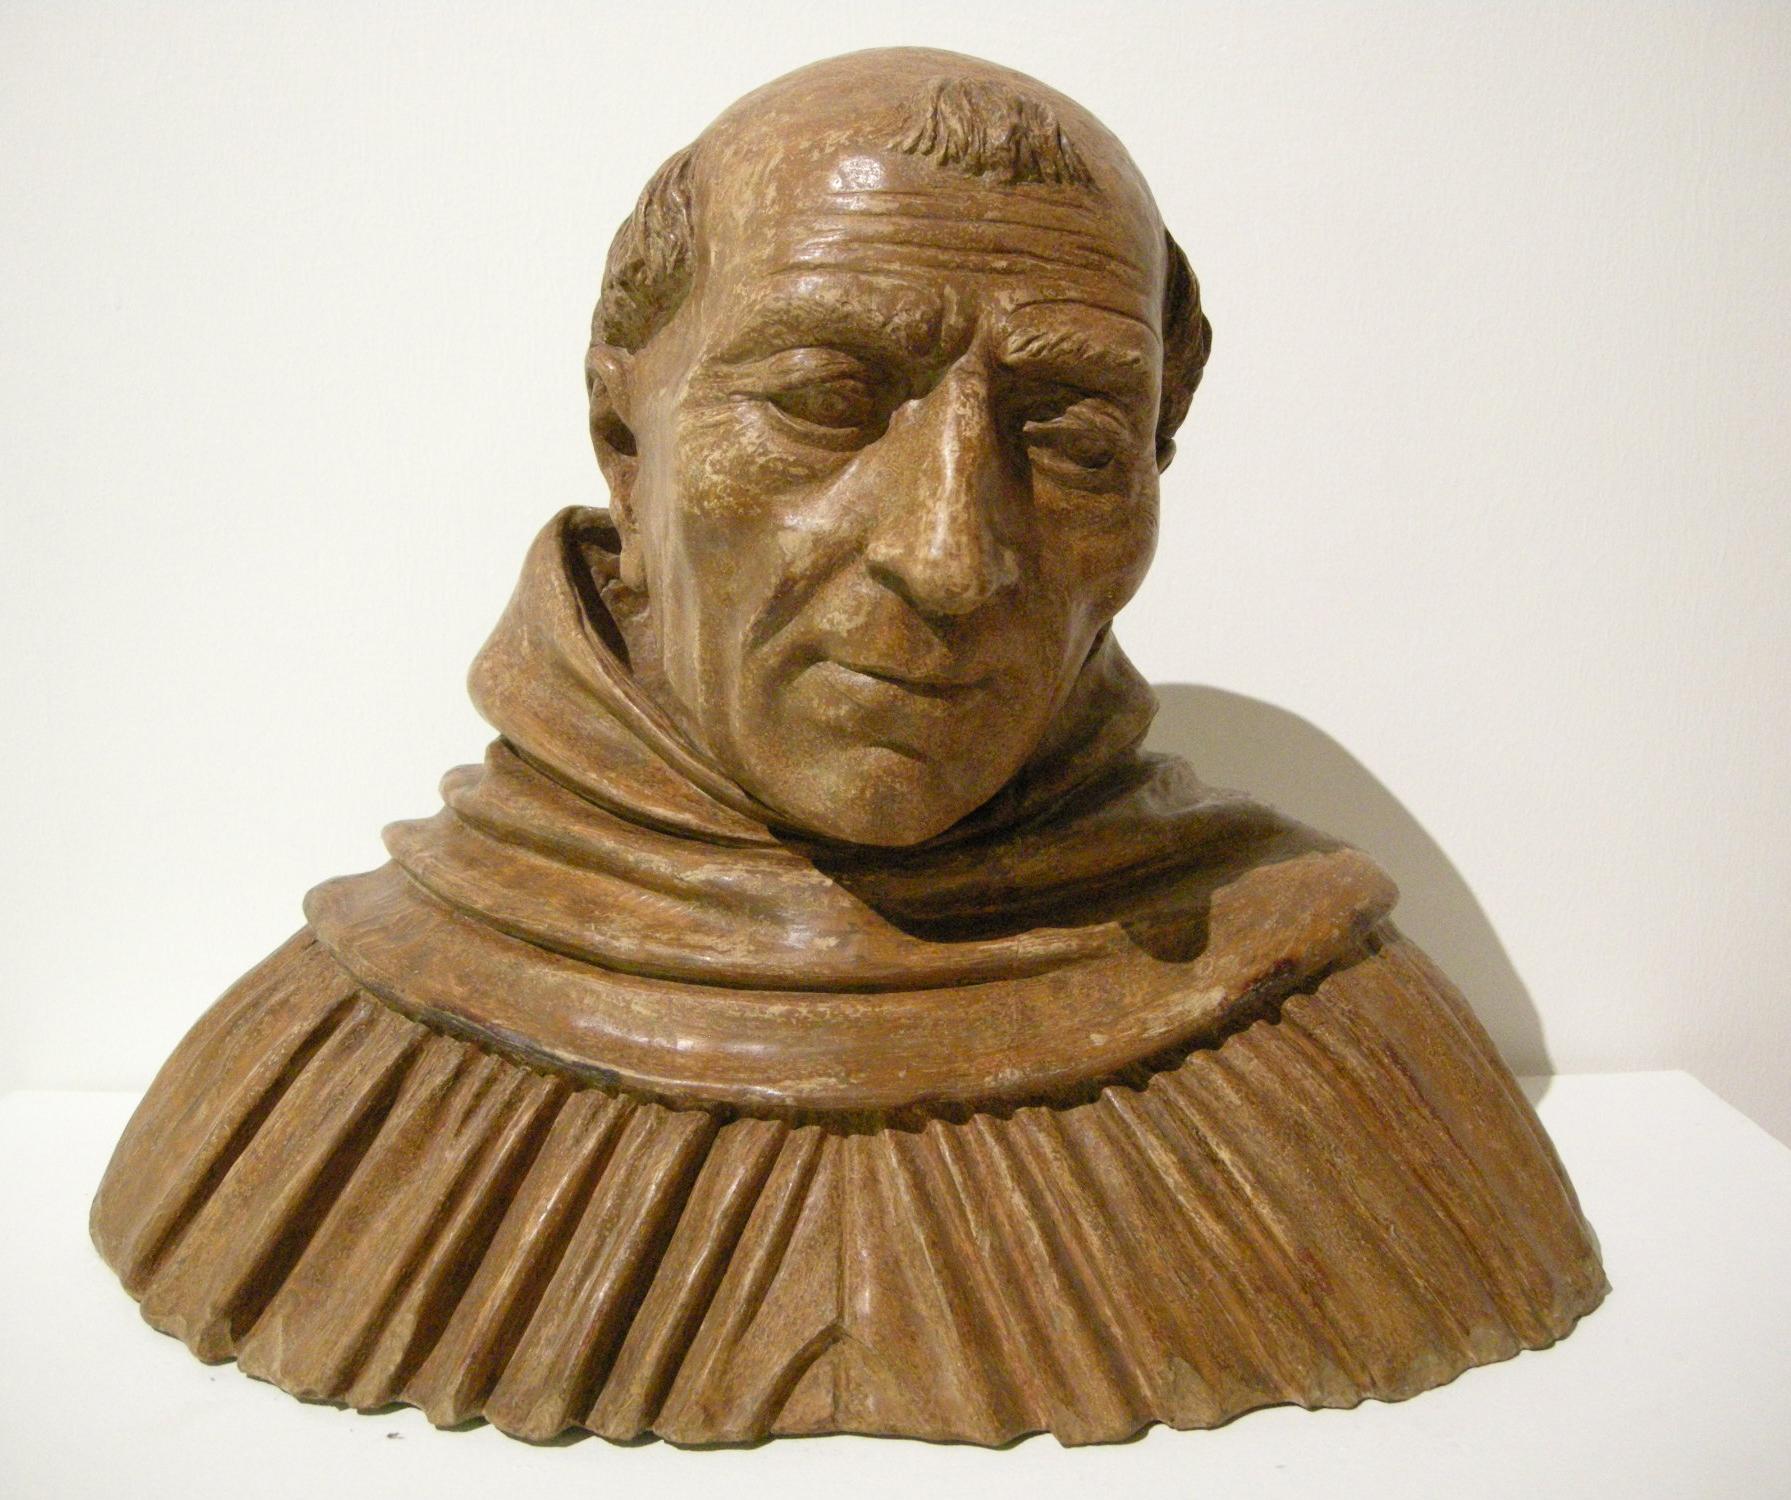 https://upload.wikimedia.org/wikipedia/commons/5/5c/Vincenzo_onofri%2C_sant%27alberto_magno%2C_1493.JPG